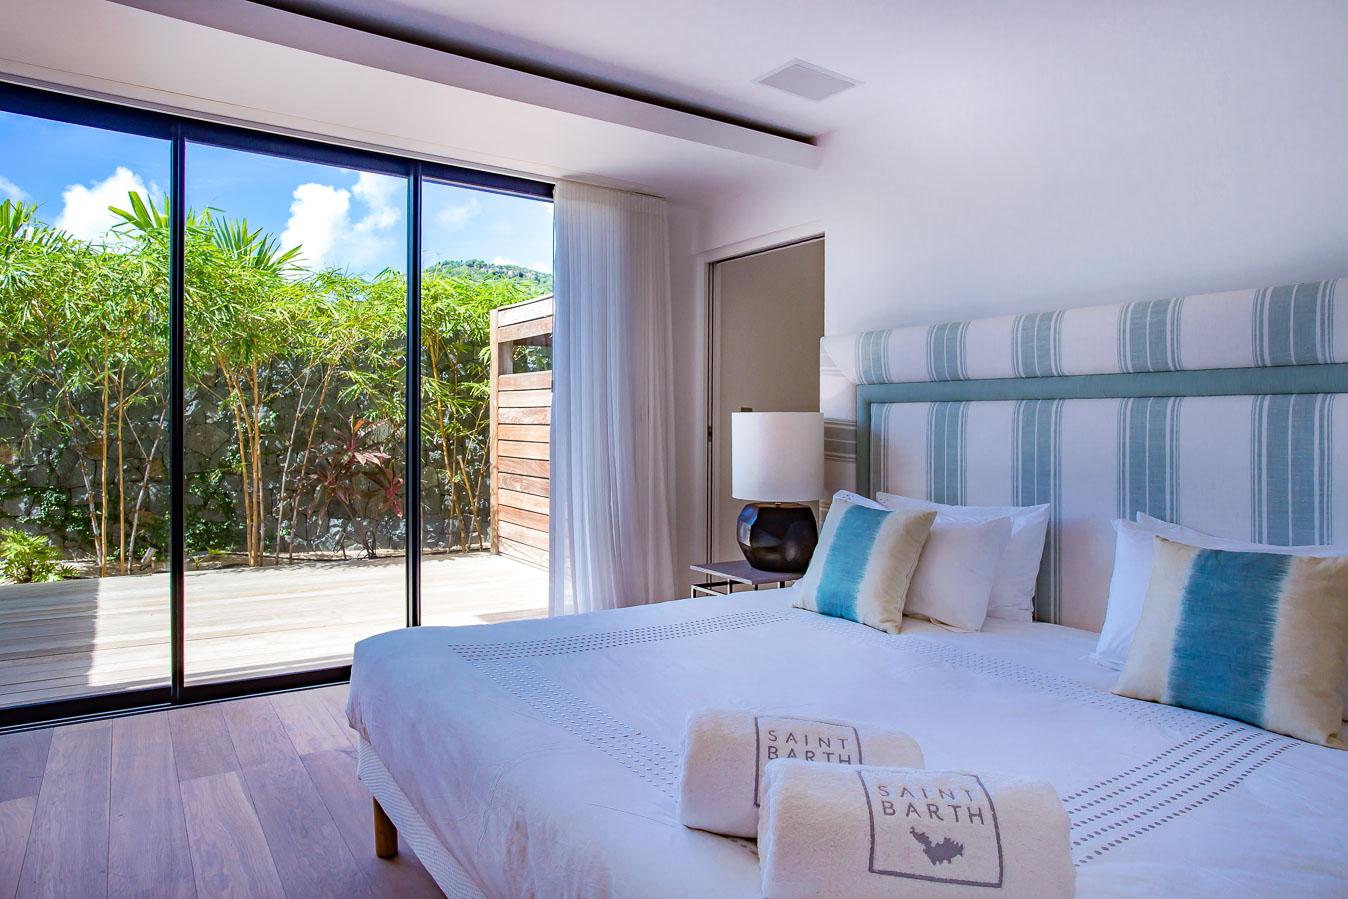 LBH Villa - Rooms & Suites (1).jpg